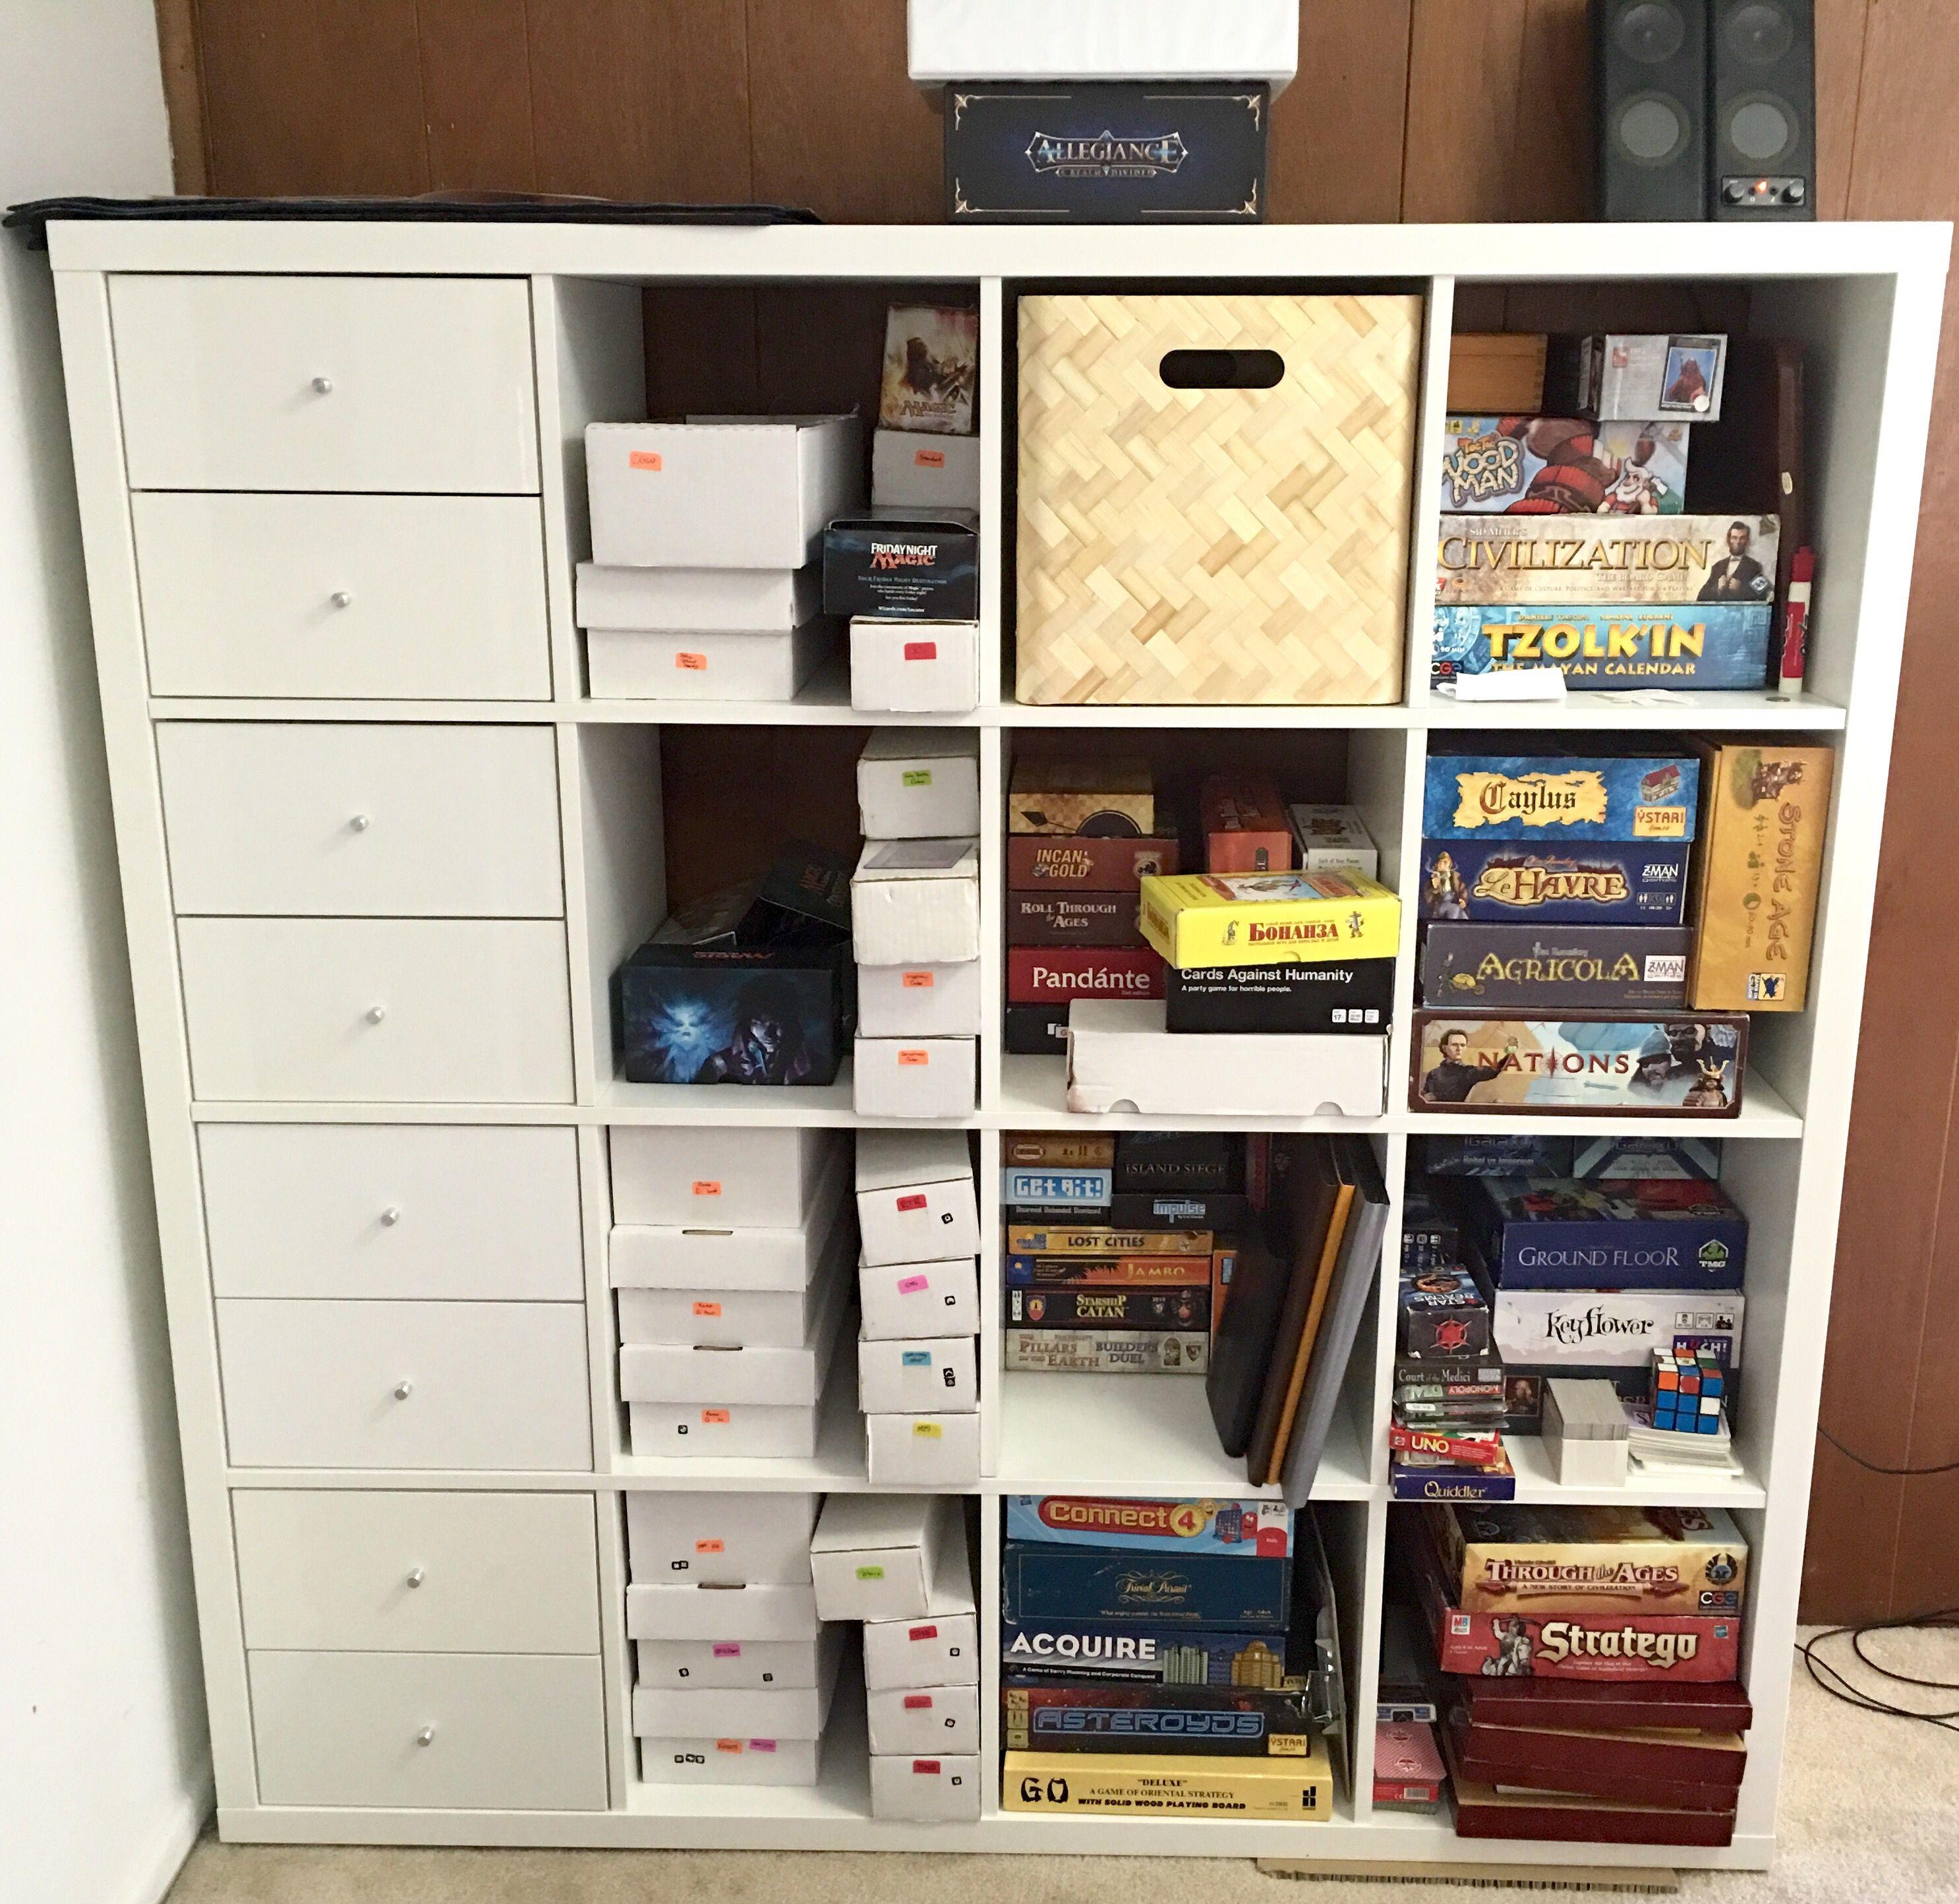 Board Game Shelves And Magic The Gathering Card Storage In Our Apartment!  IKEA   Kallax 4 X 4 IKEA   Kallax Drawers